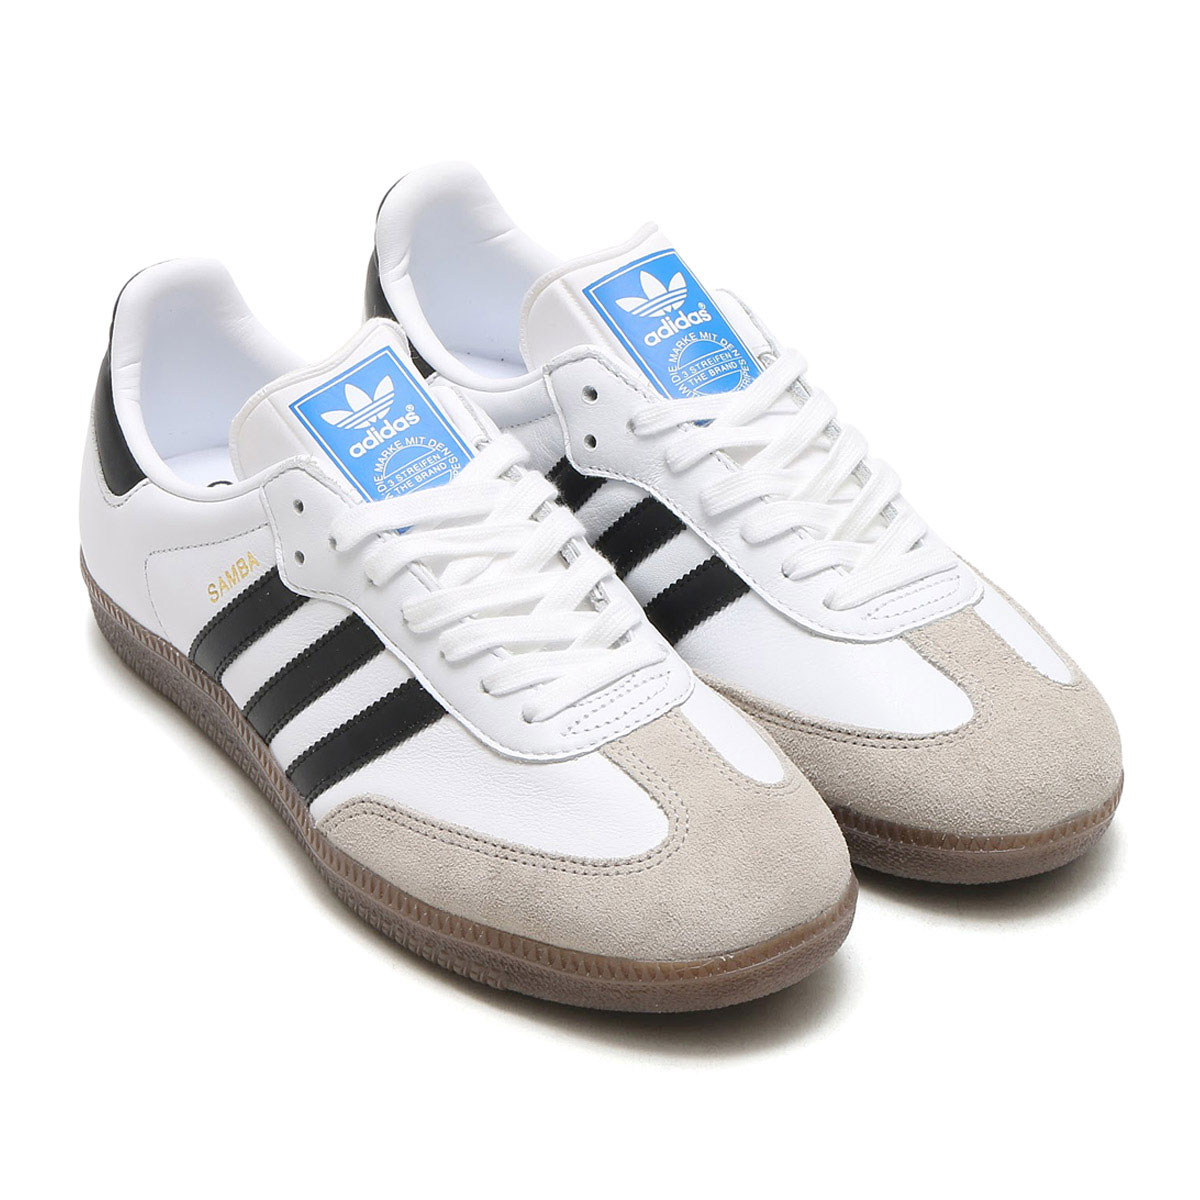 adidas Originals SAMBA(アディダス オリジナルス サンバ)(Running White/Core Black/Clear Granite) 【メンズ スニーカー】17FW-I